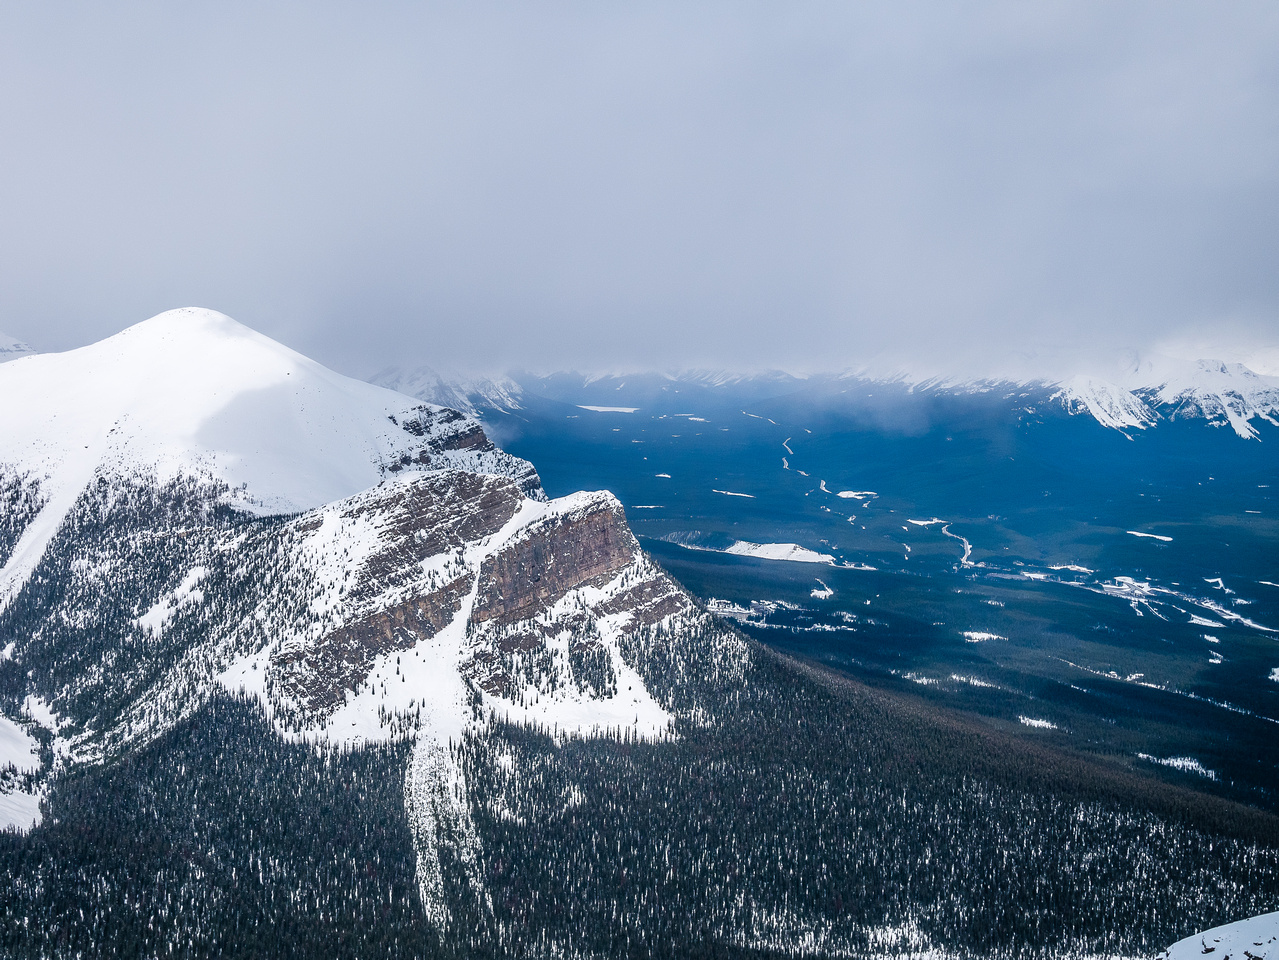 Looking over Mount Fairview.